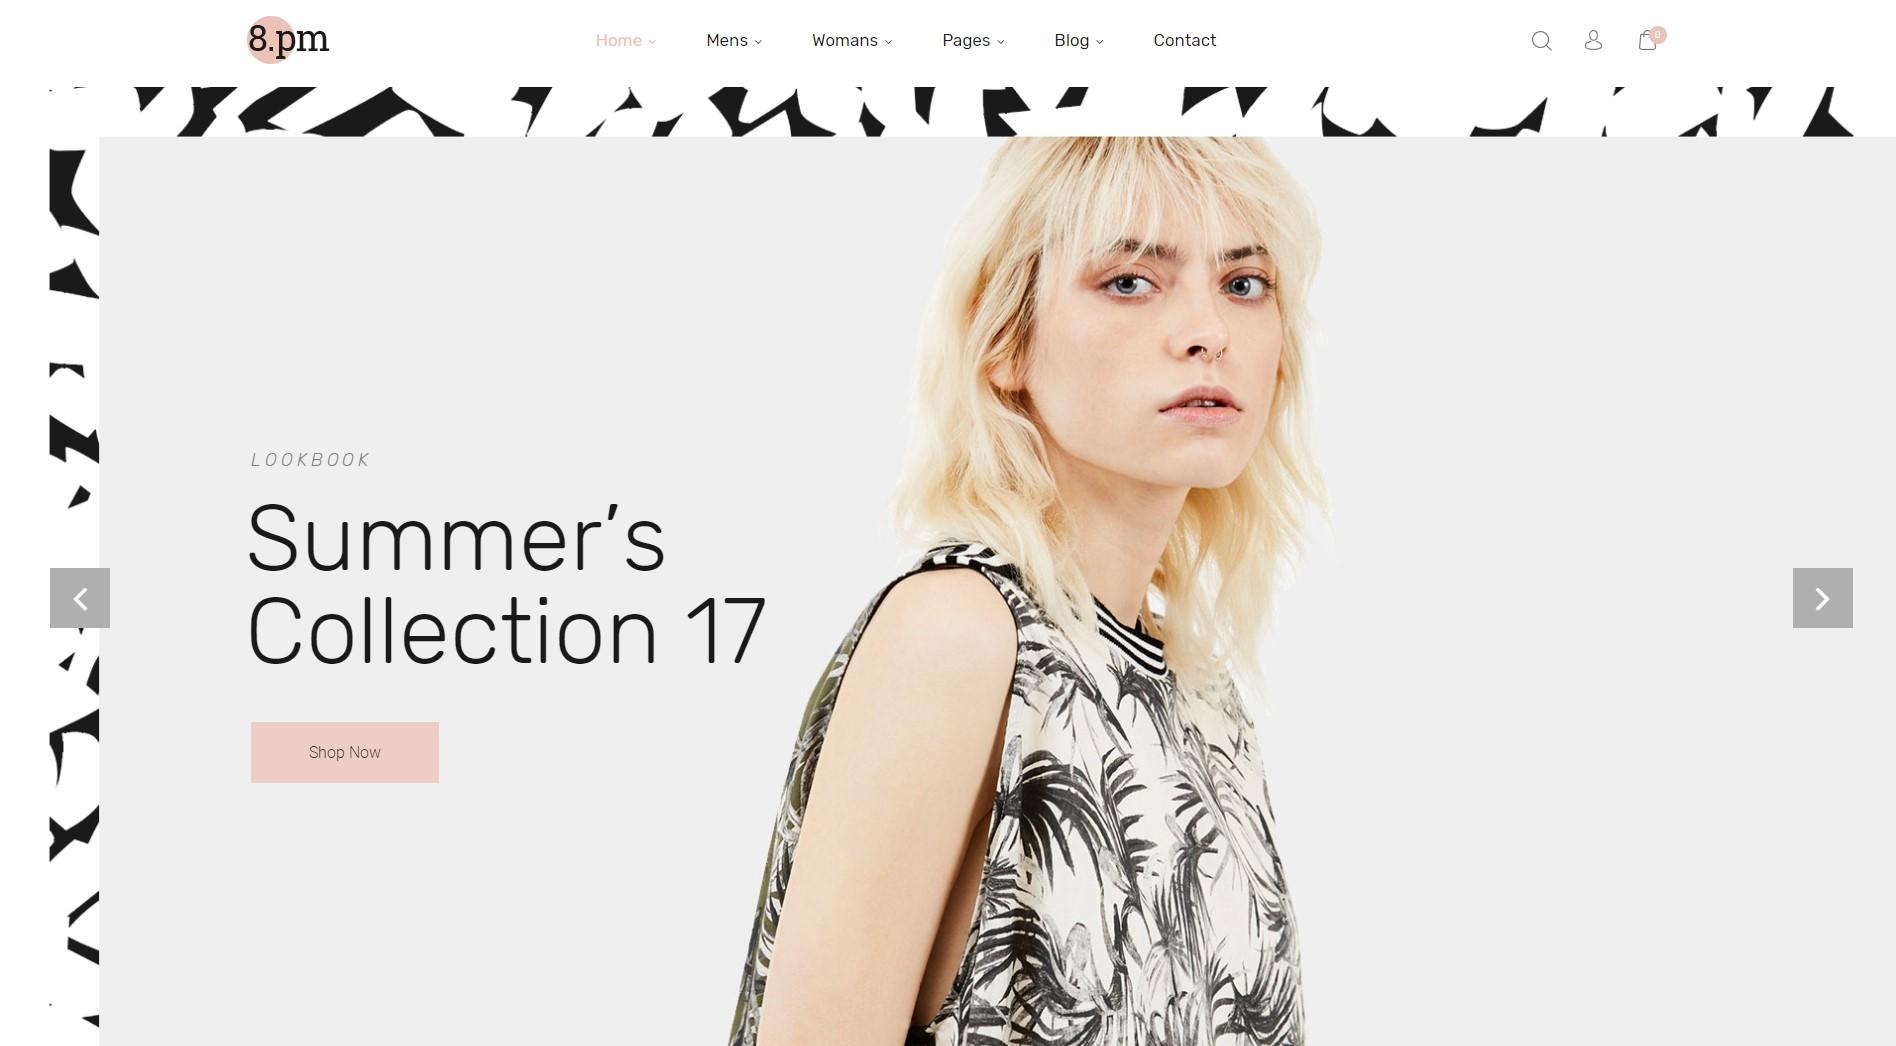 Eightpm - Free WordPress Theme Fashion Store